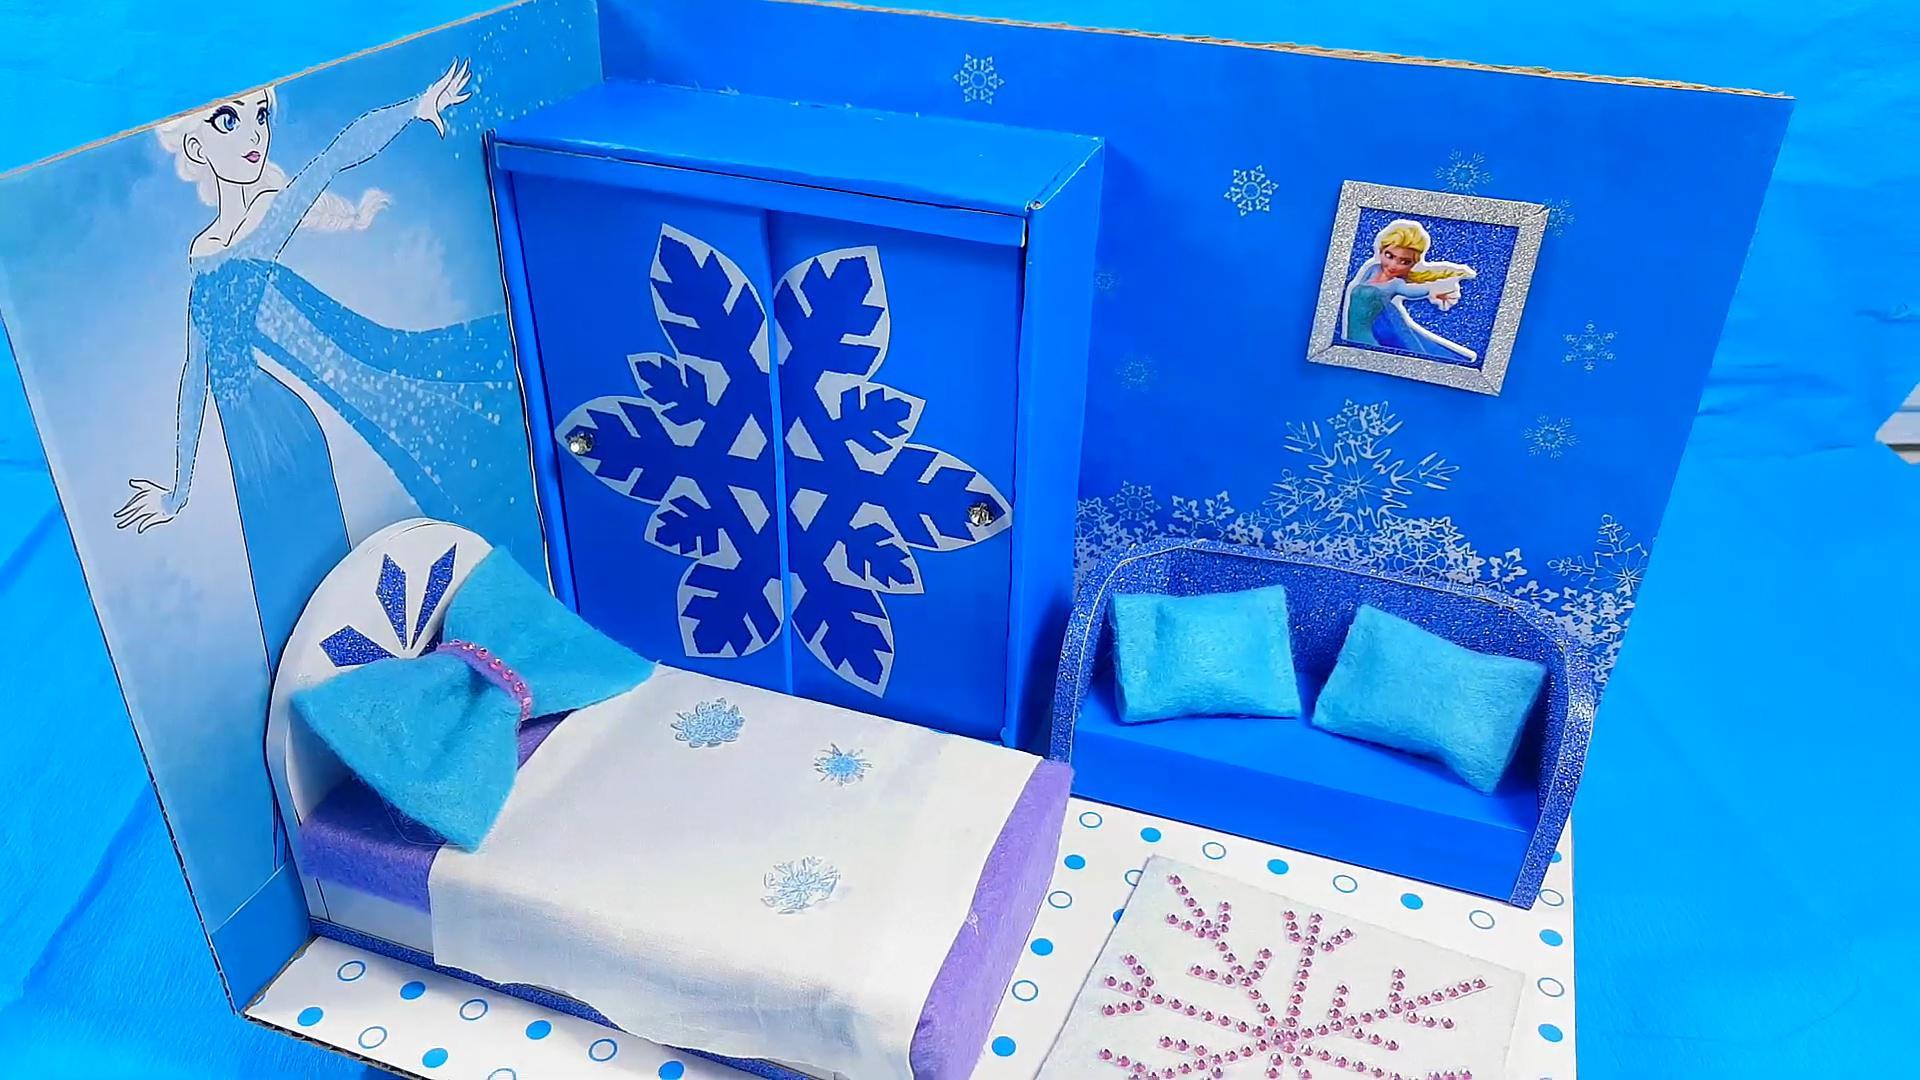 DIY迷你娃娃屋,艾莎公主的天蓝色房间